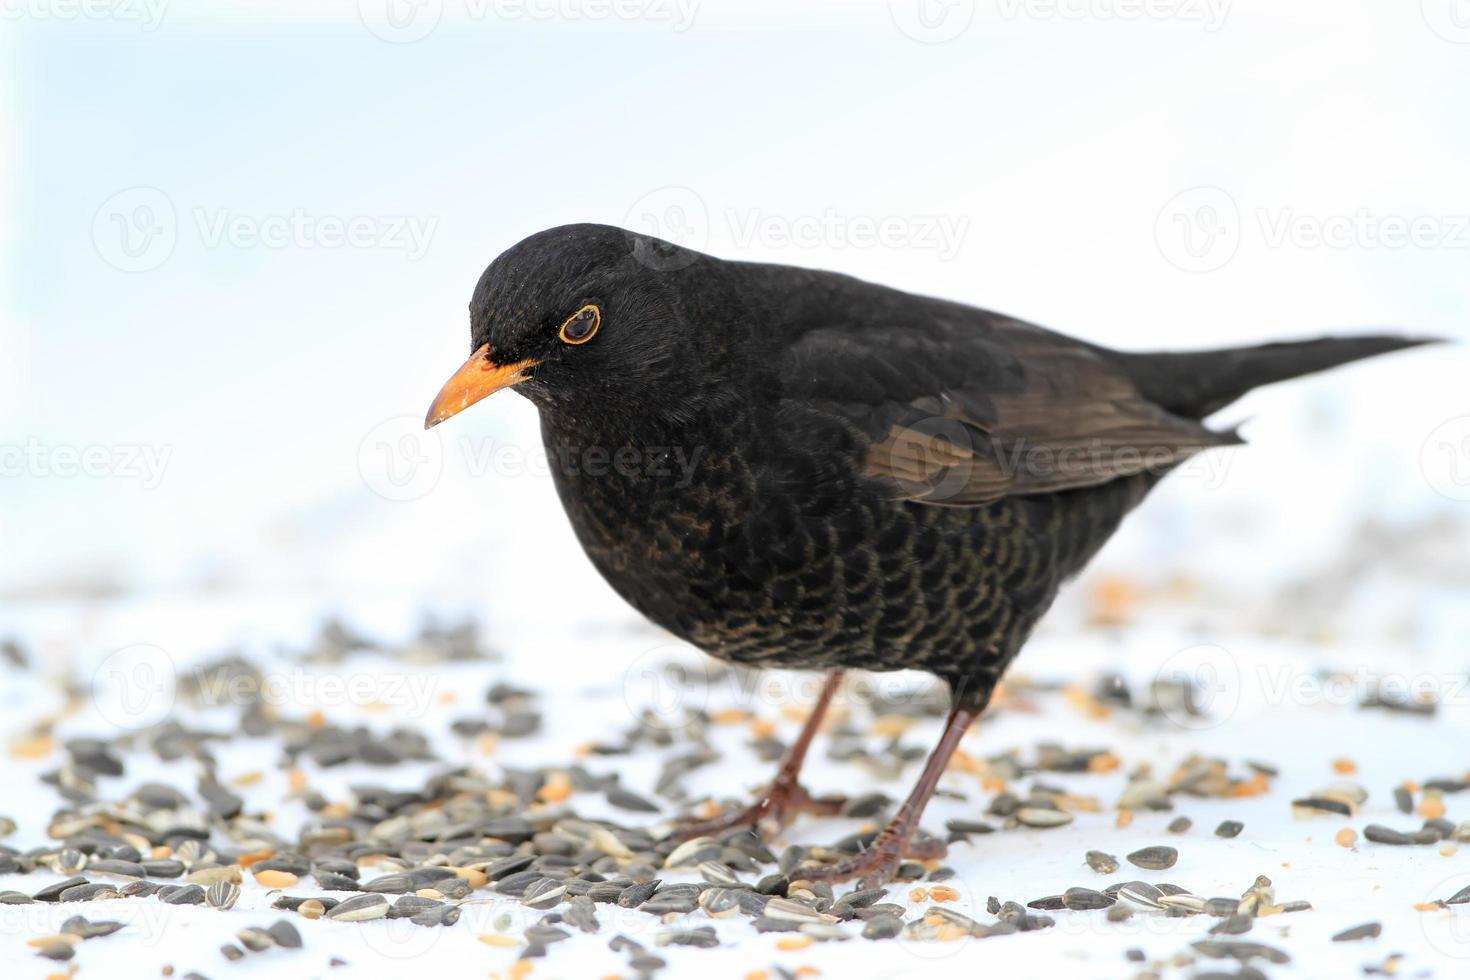 encontrar comida no inverno foto